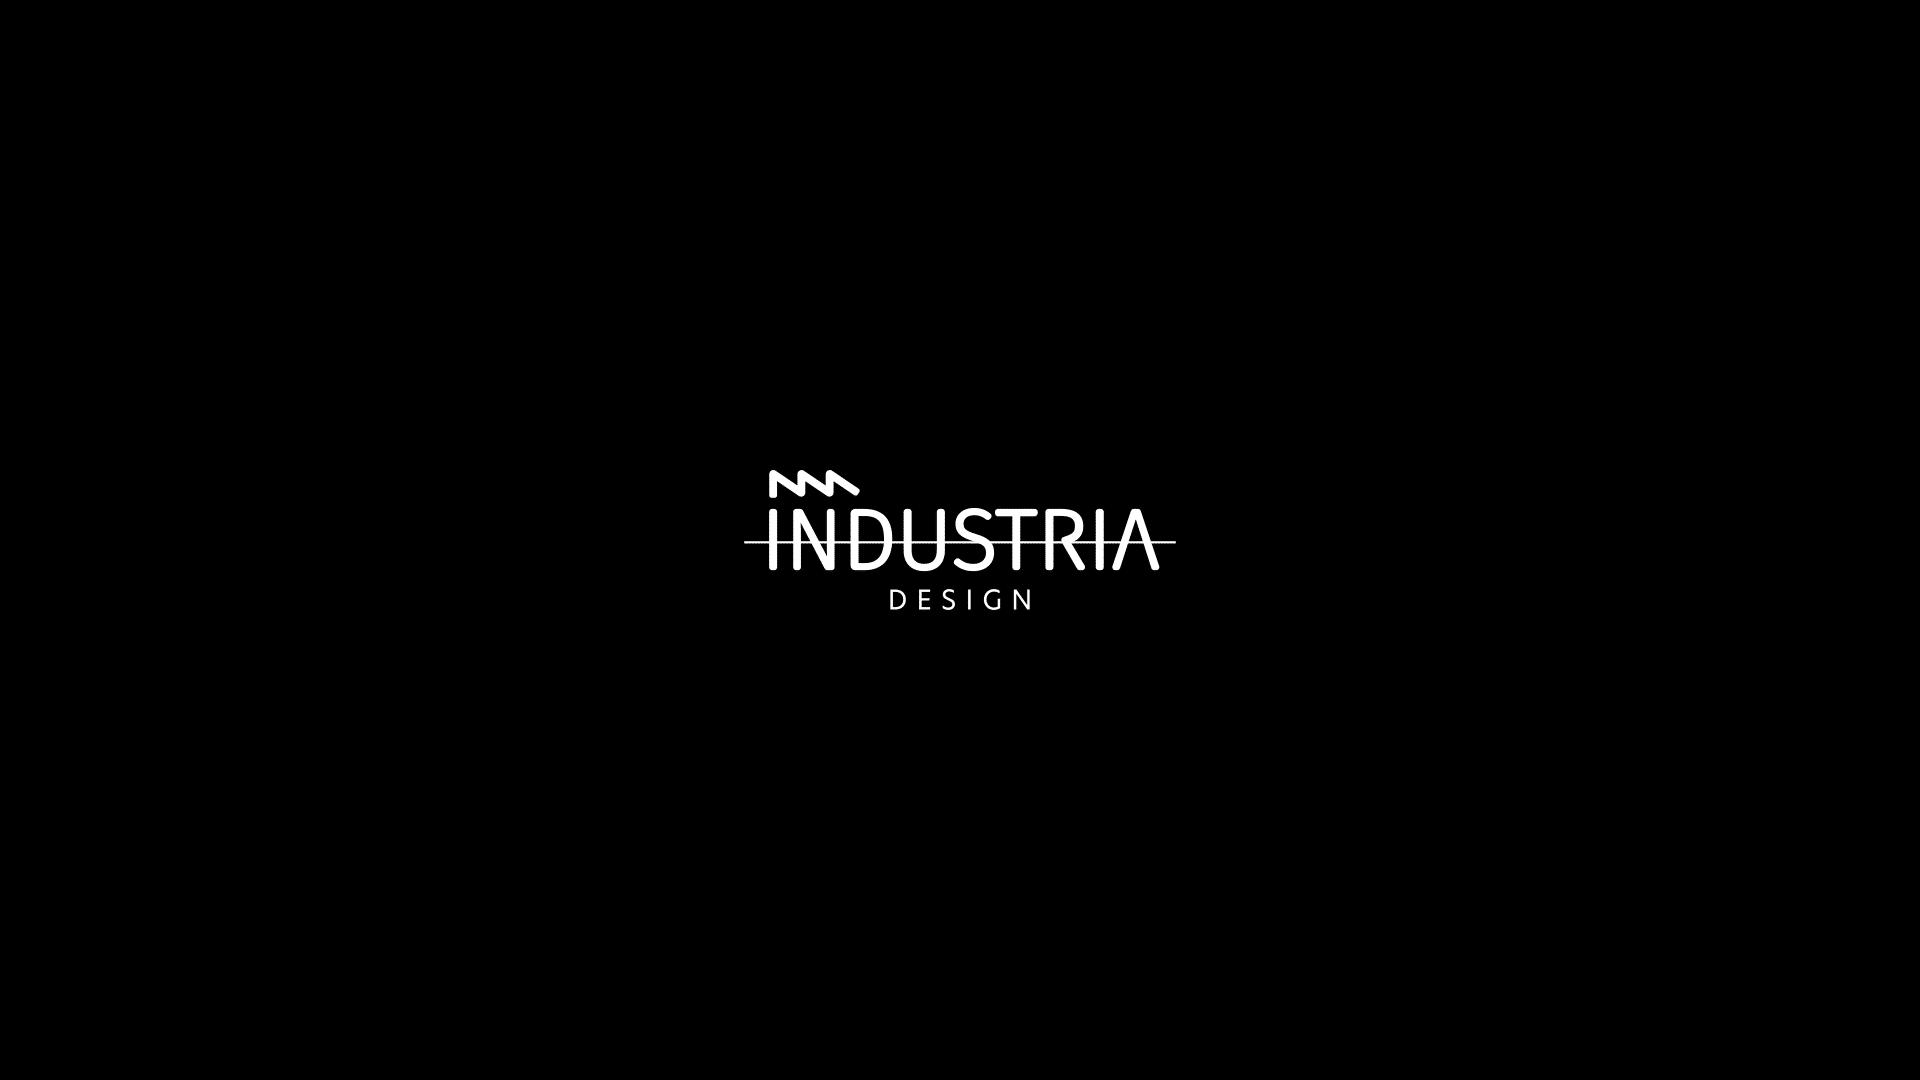 industria design logo refresh 02